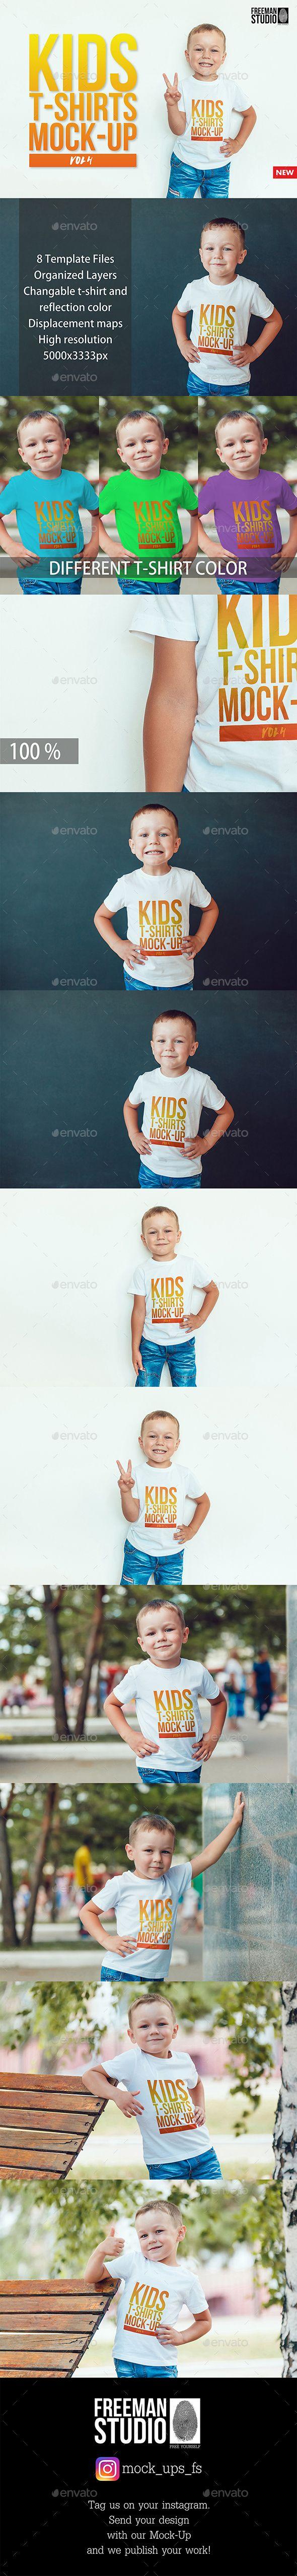 Download Kids T Shirt Mock Up Kids Tshirts Tshirt Mockup Mockup Photoshop